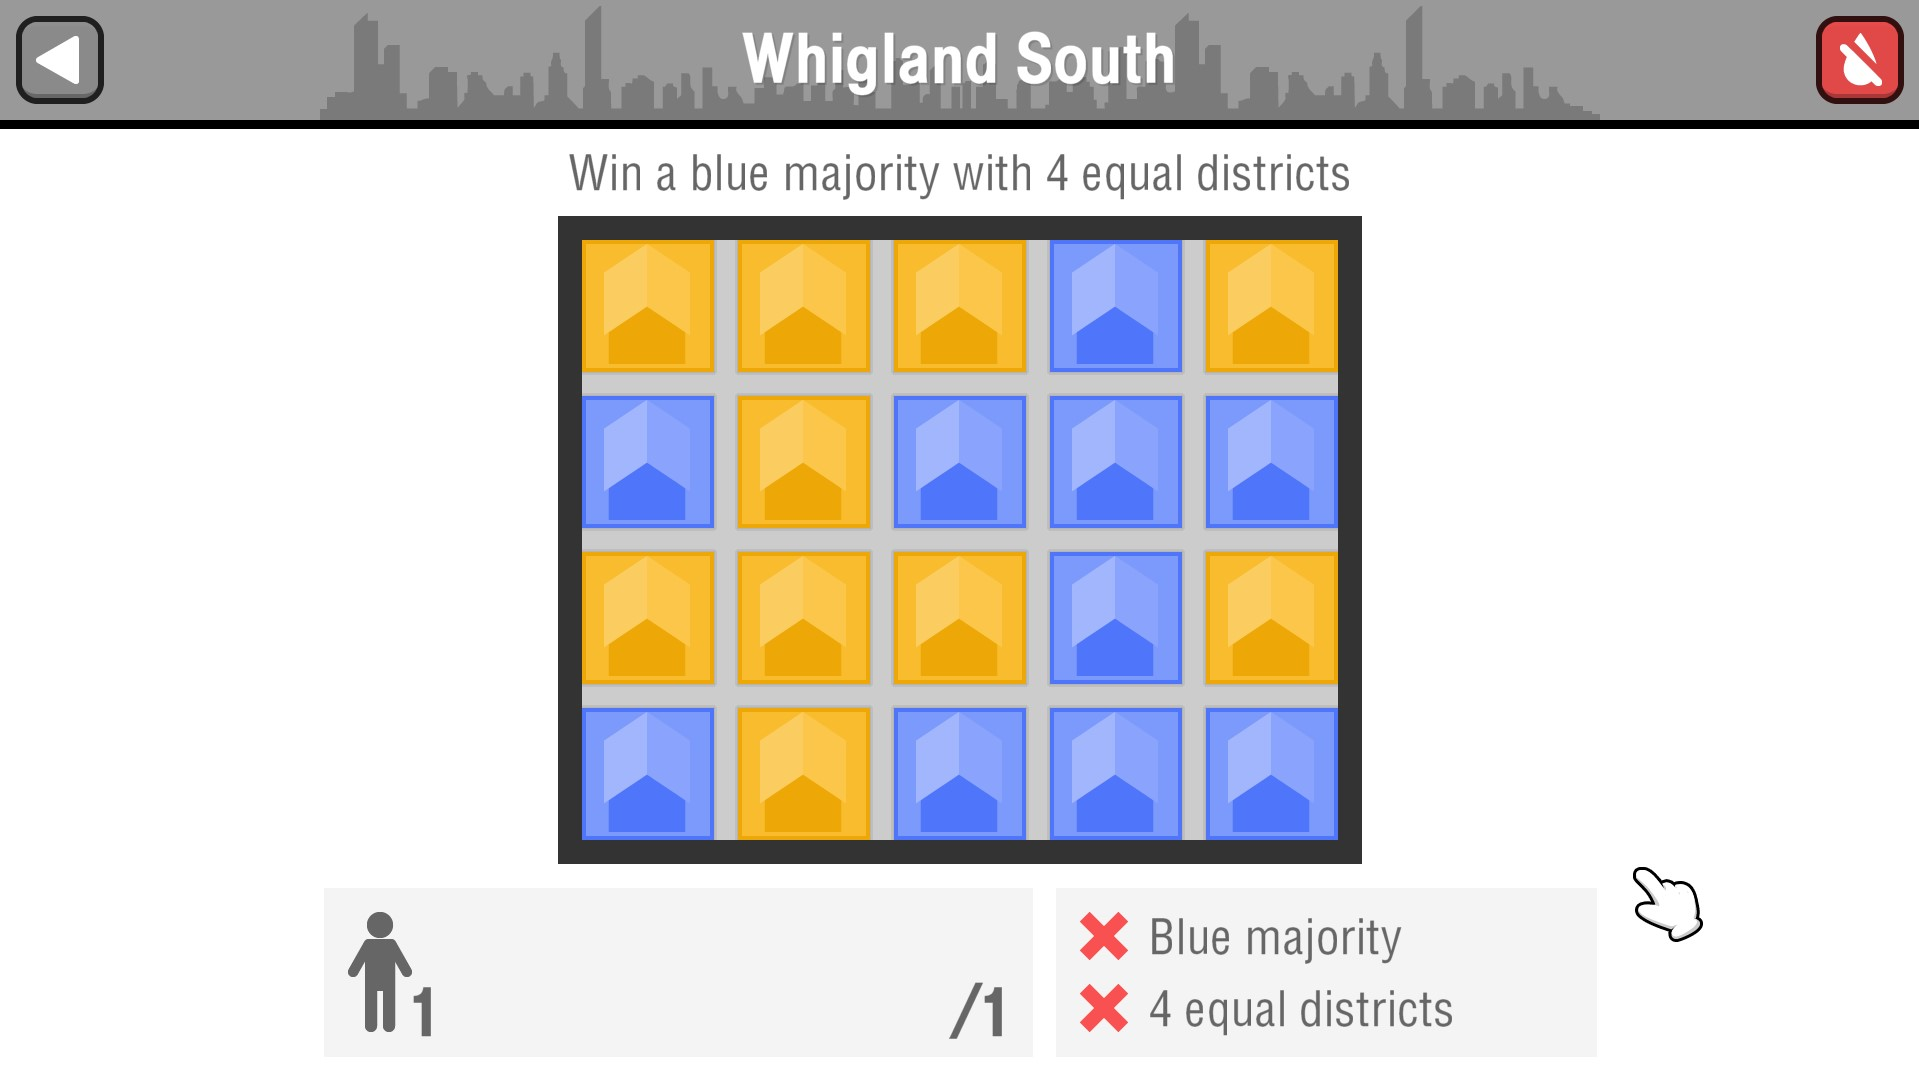 Whigland South